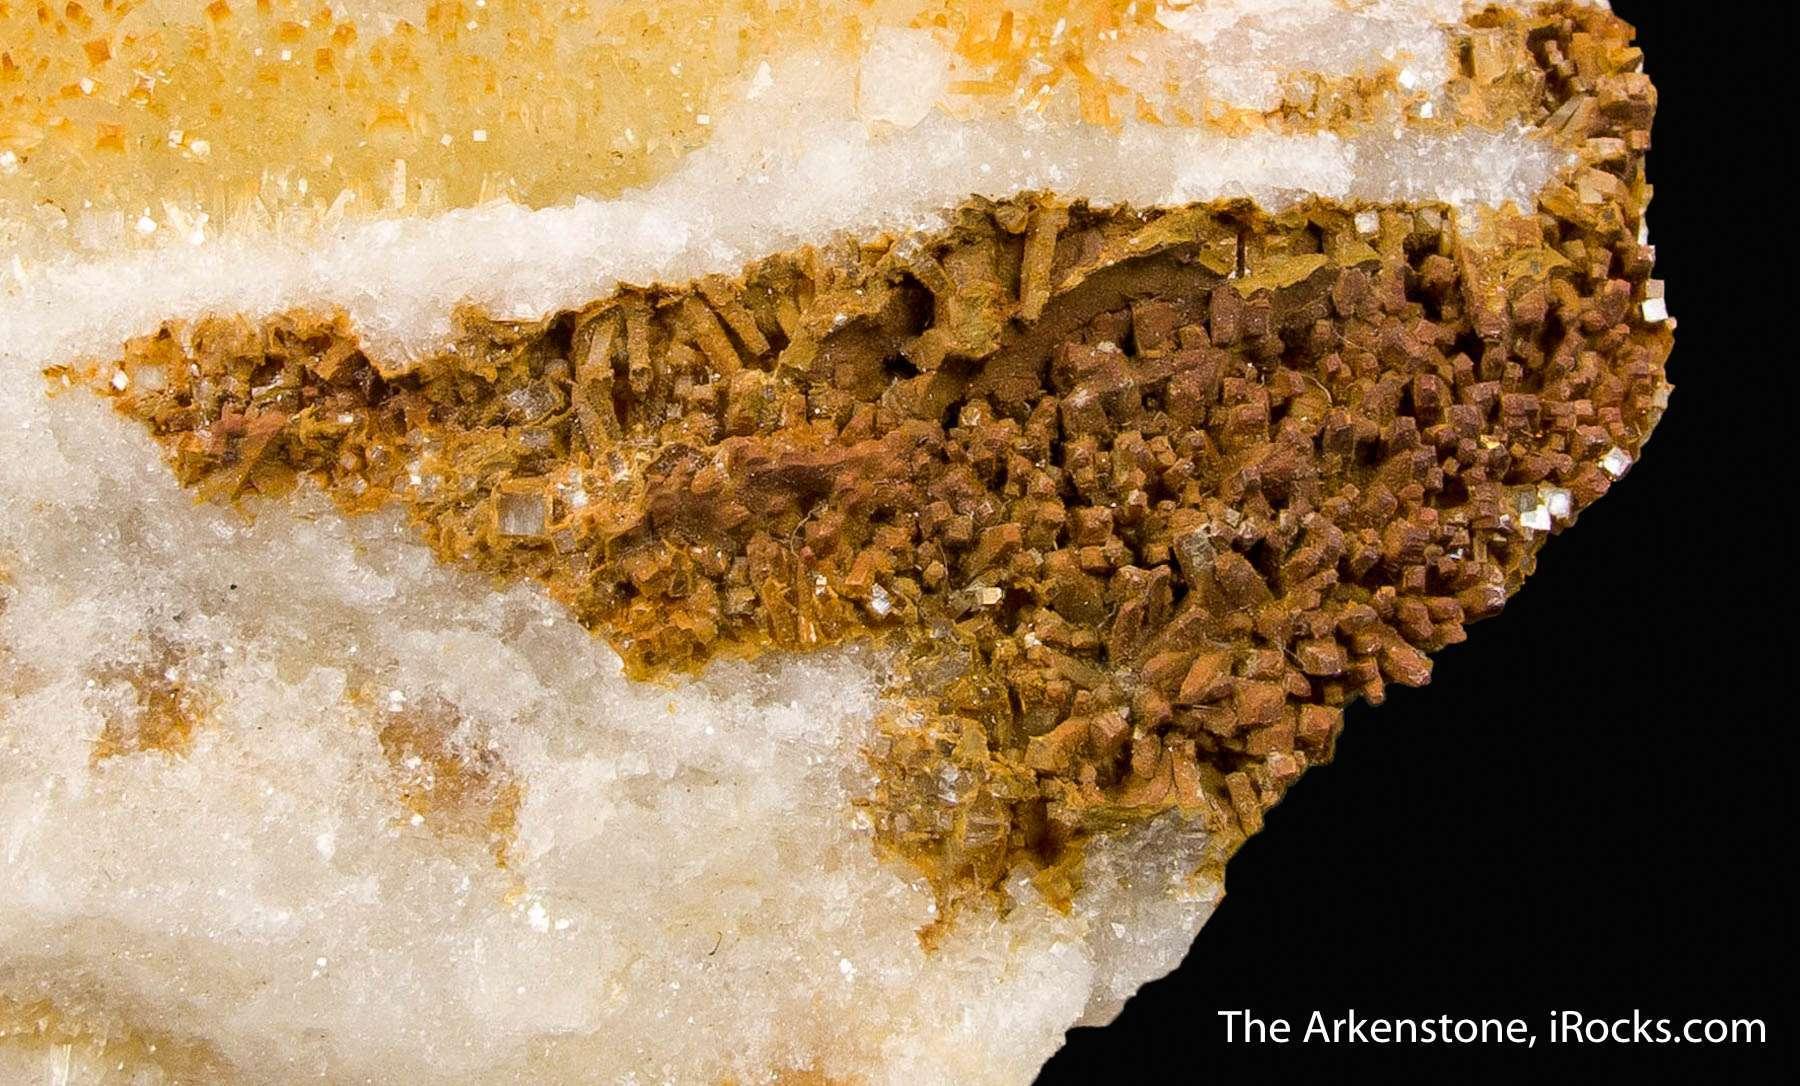 This noteworthy attractive specimen thomsenolite ralstonite